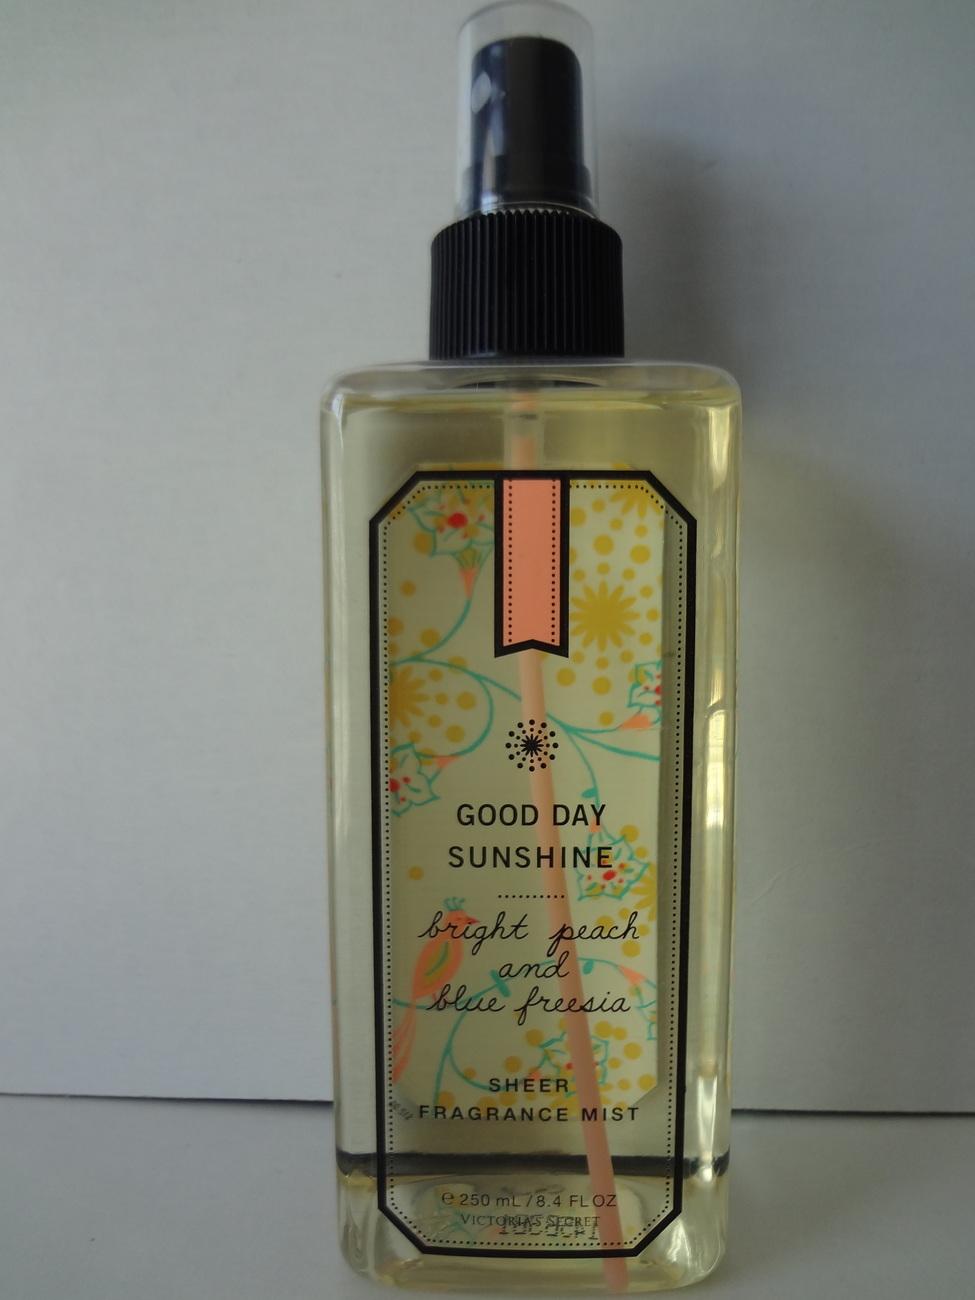 29cfb78b524 Victoria s Secret GOOD DAY SUNSHINE Sheer Fragrance Mist 8.4 fl oz   250 ml